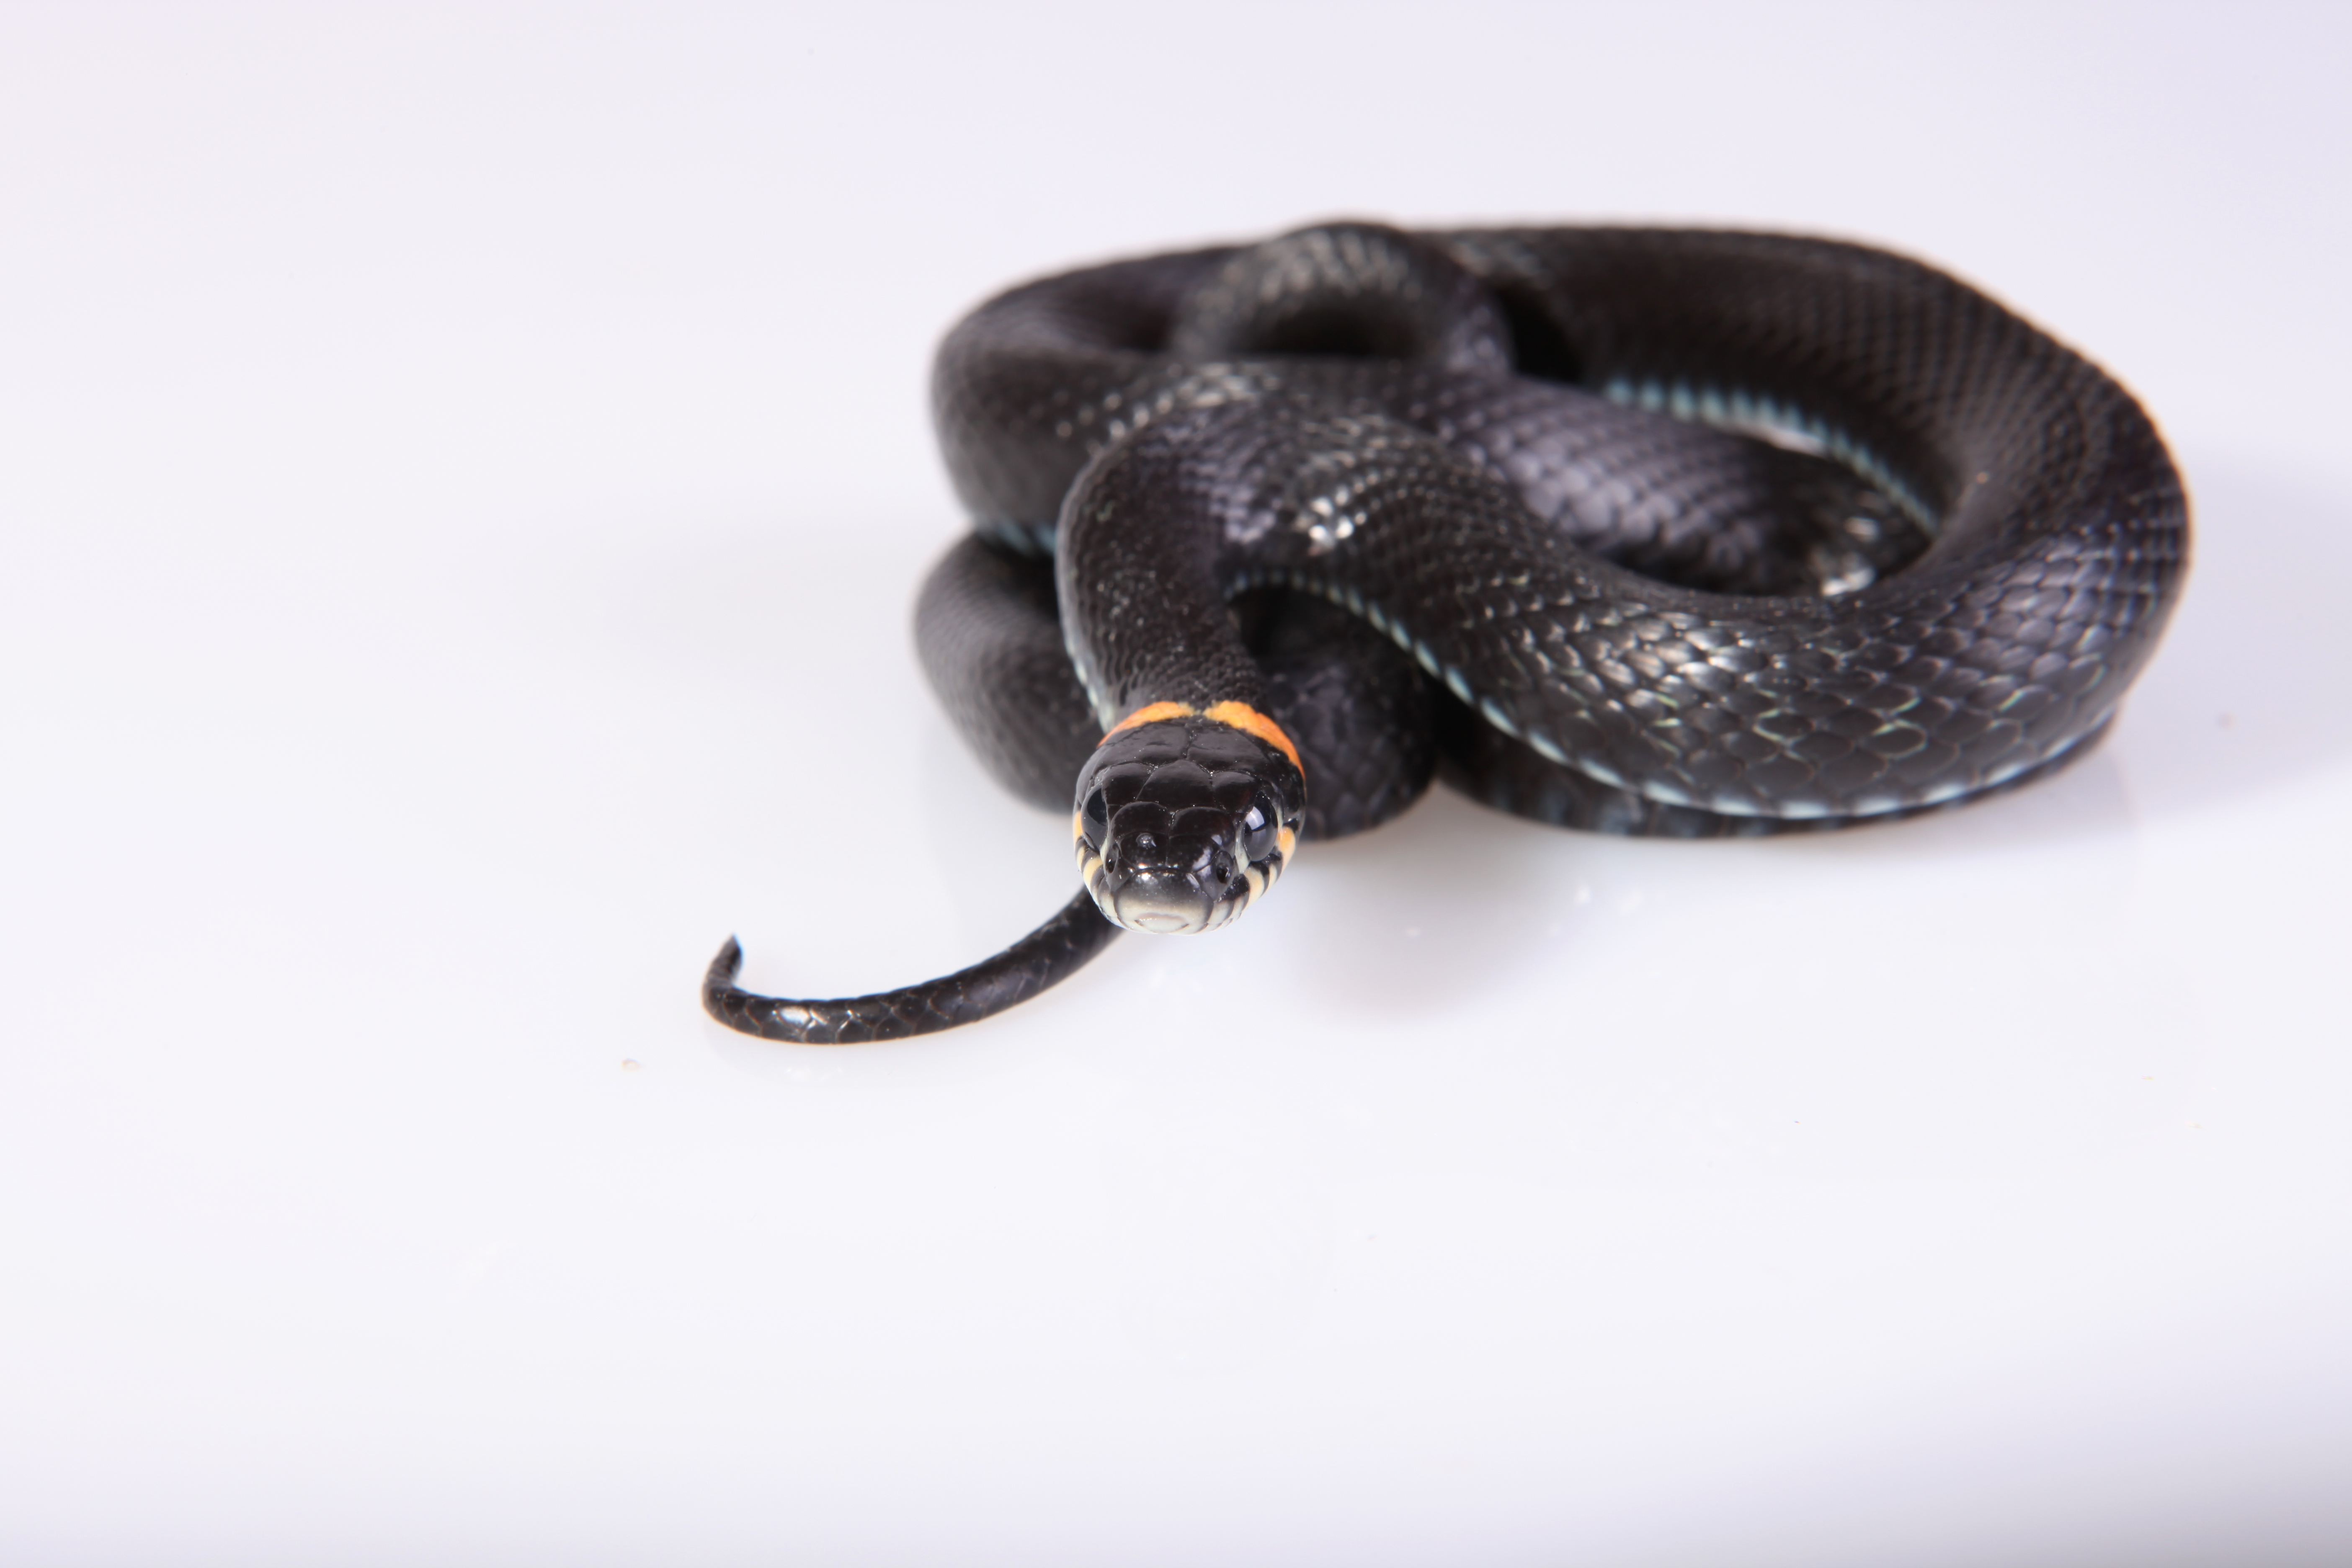 Snake, Animal, One, Tongue, Threats, HQ Photo